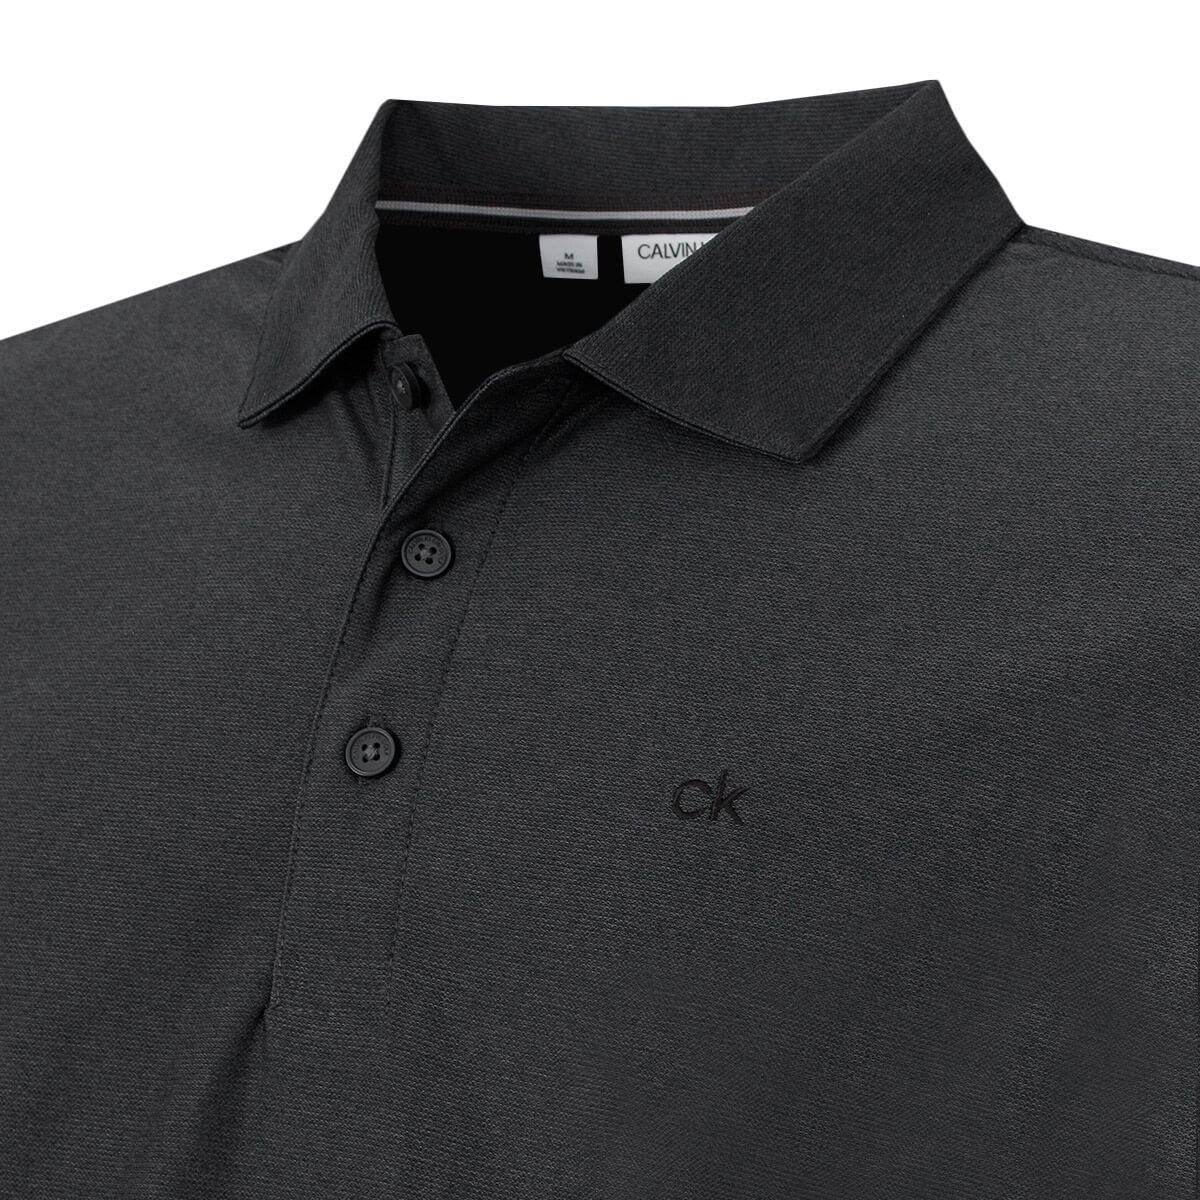 Calvin-Klein-Homme-2020-a-manches-longues-Light-Central-Golf-Polo-Shirt-45-off-RRP miniature 7